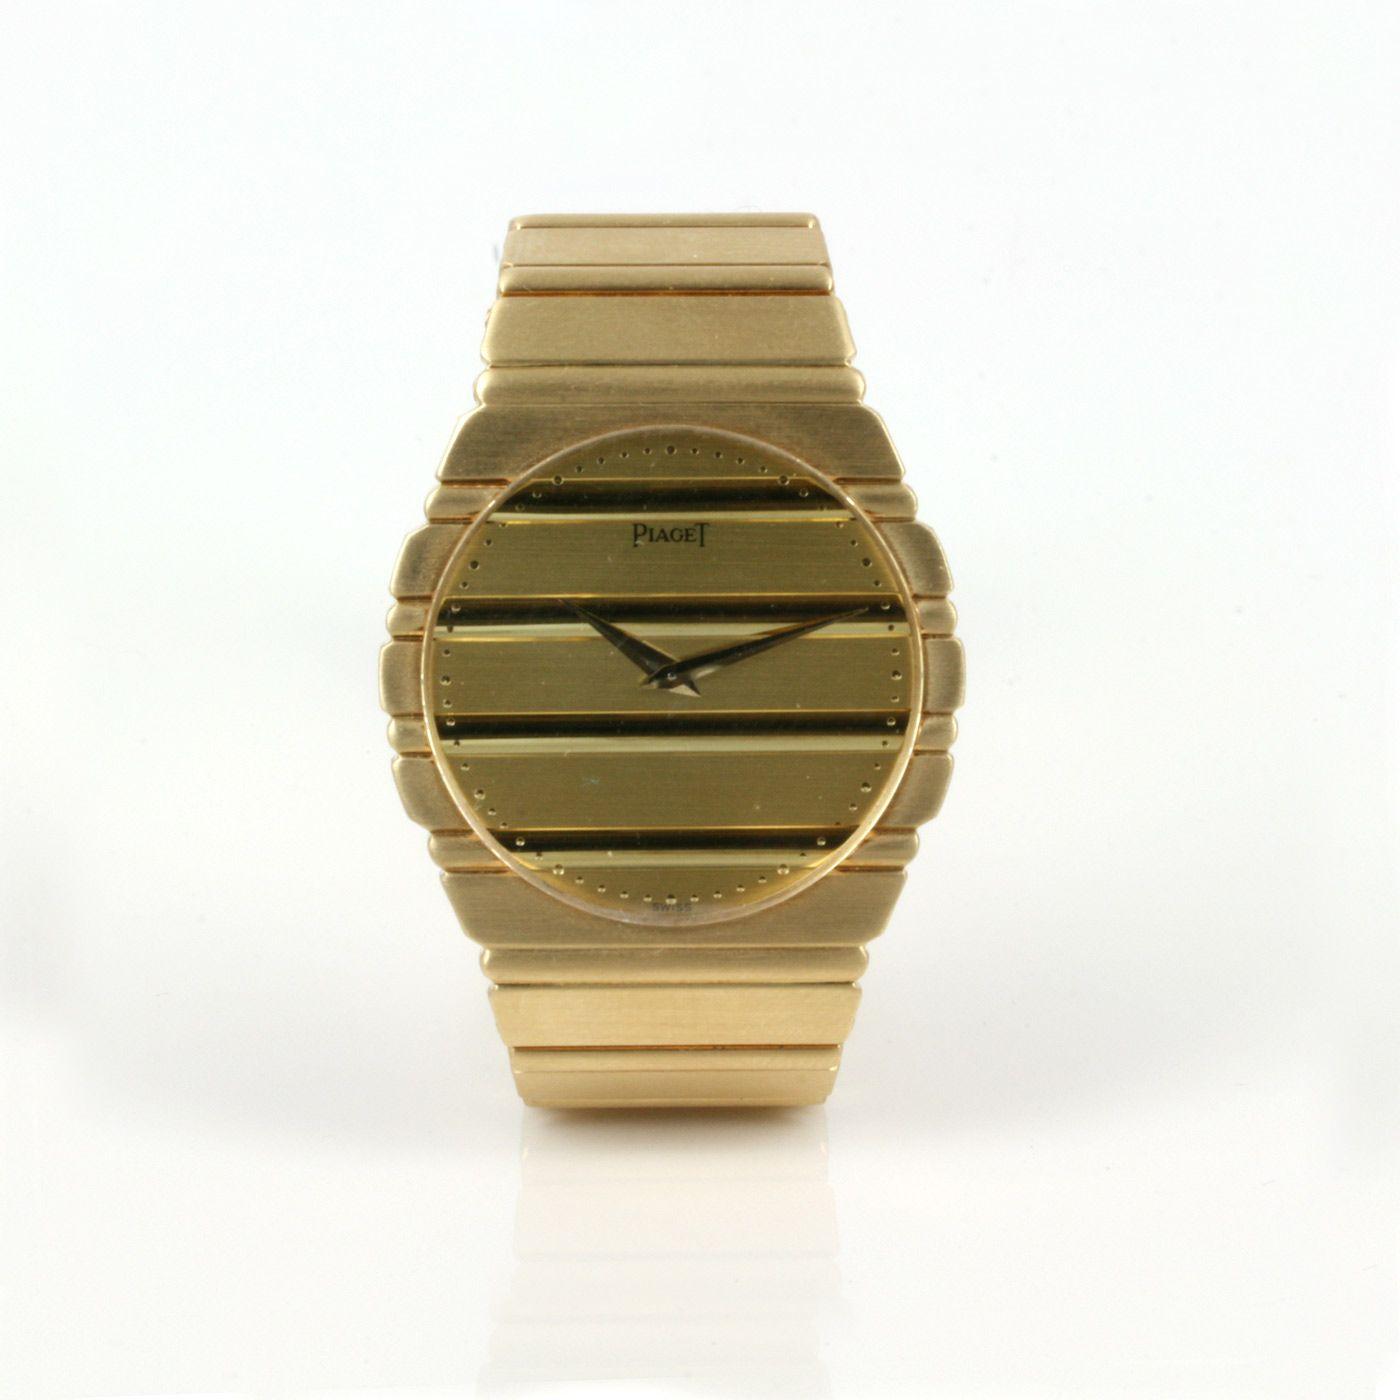 7bab24b6f59 piaget watches